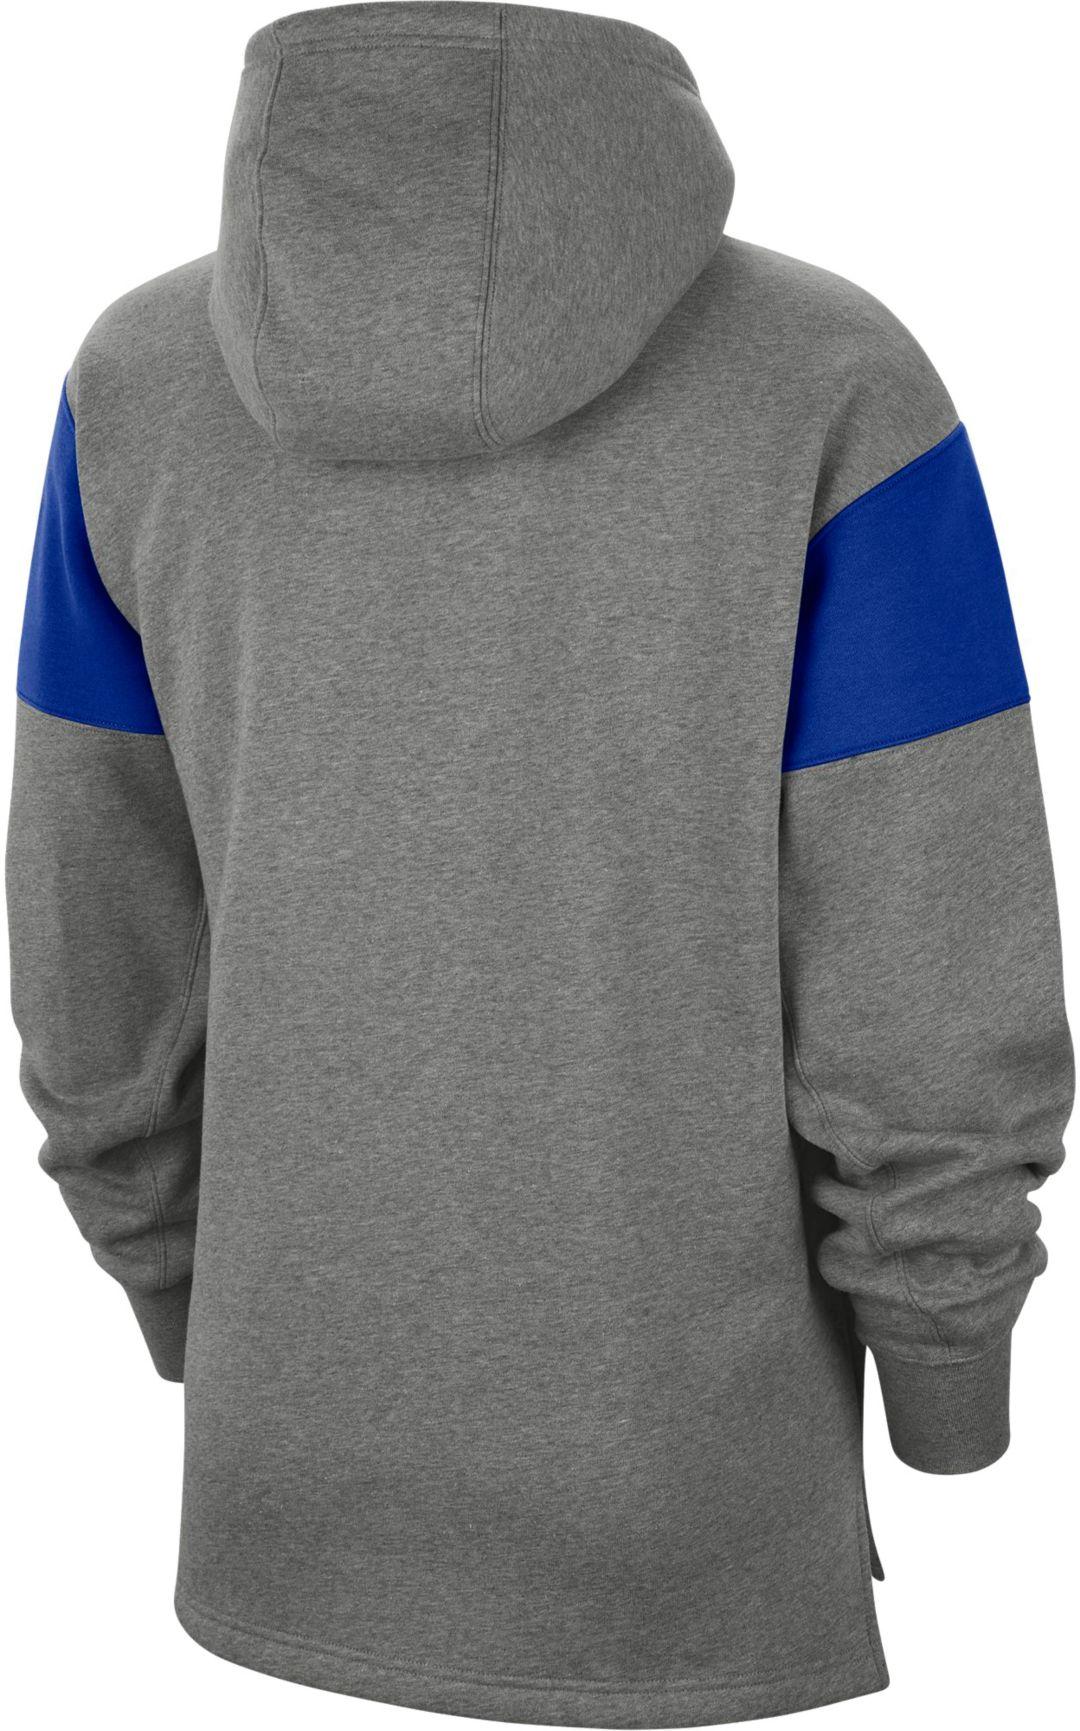 reputable site f5fe7 406bf Nike Men's Dallas Cowboys Historic Pullover Grey Hoodie